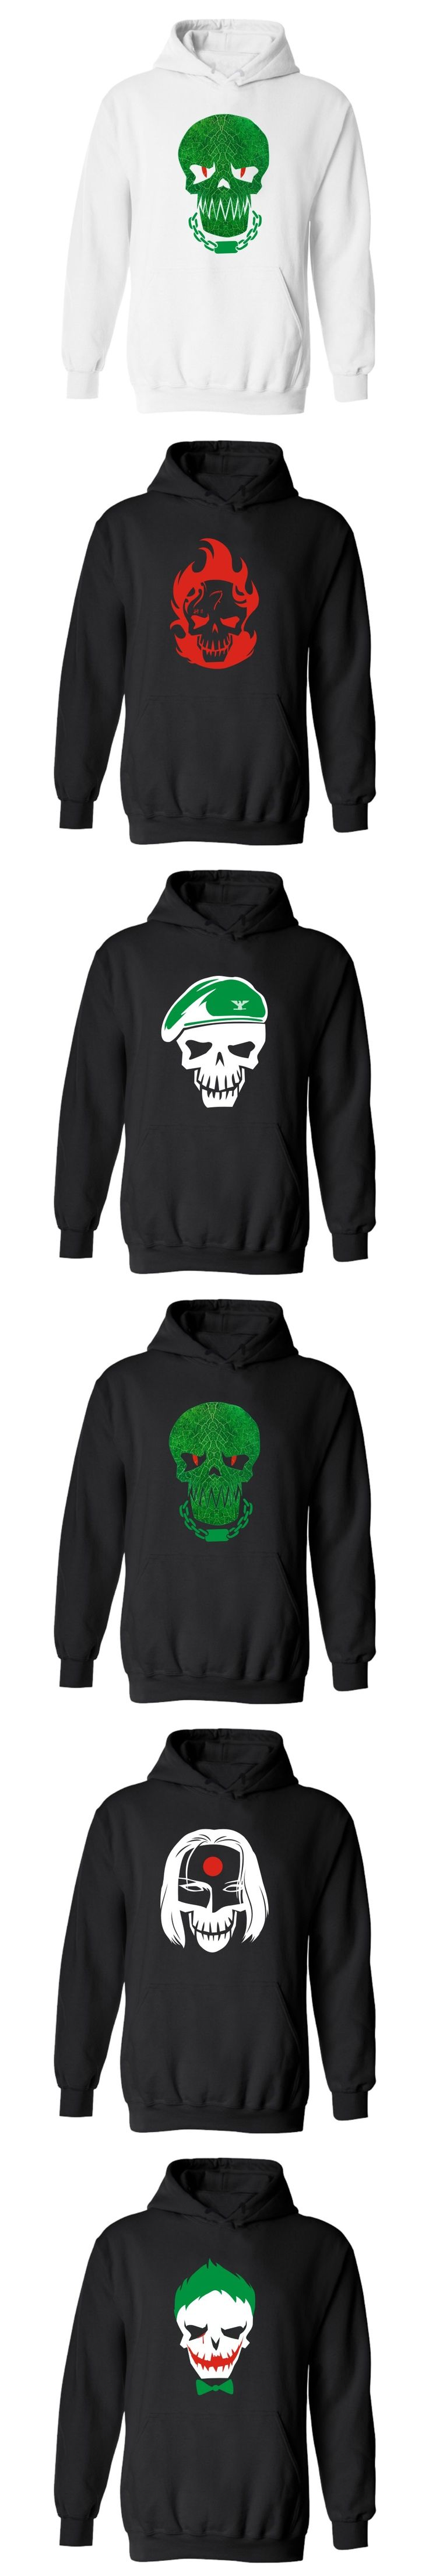 Hero Suicide Squad Joker Punk Hooded Hoodies Men Hip Hop Fashion Funny Sweatshirt Men Hoodie Casual Winter Clothes High Quality